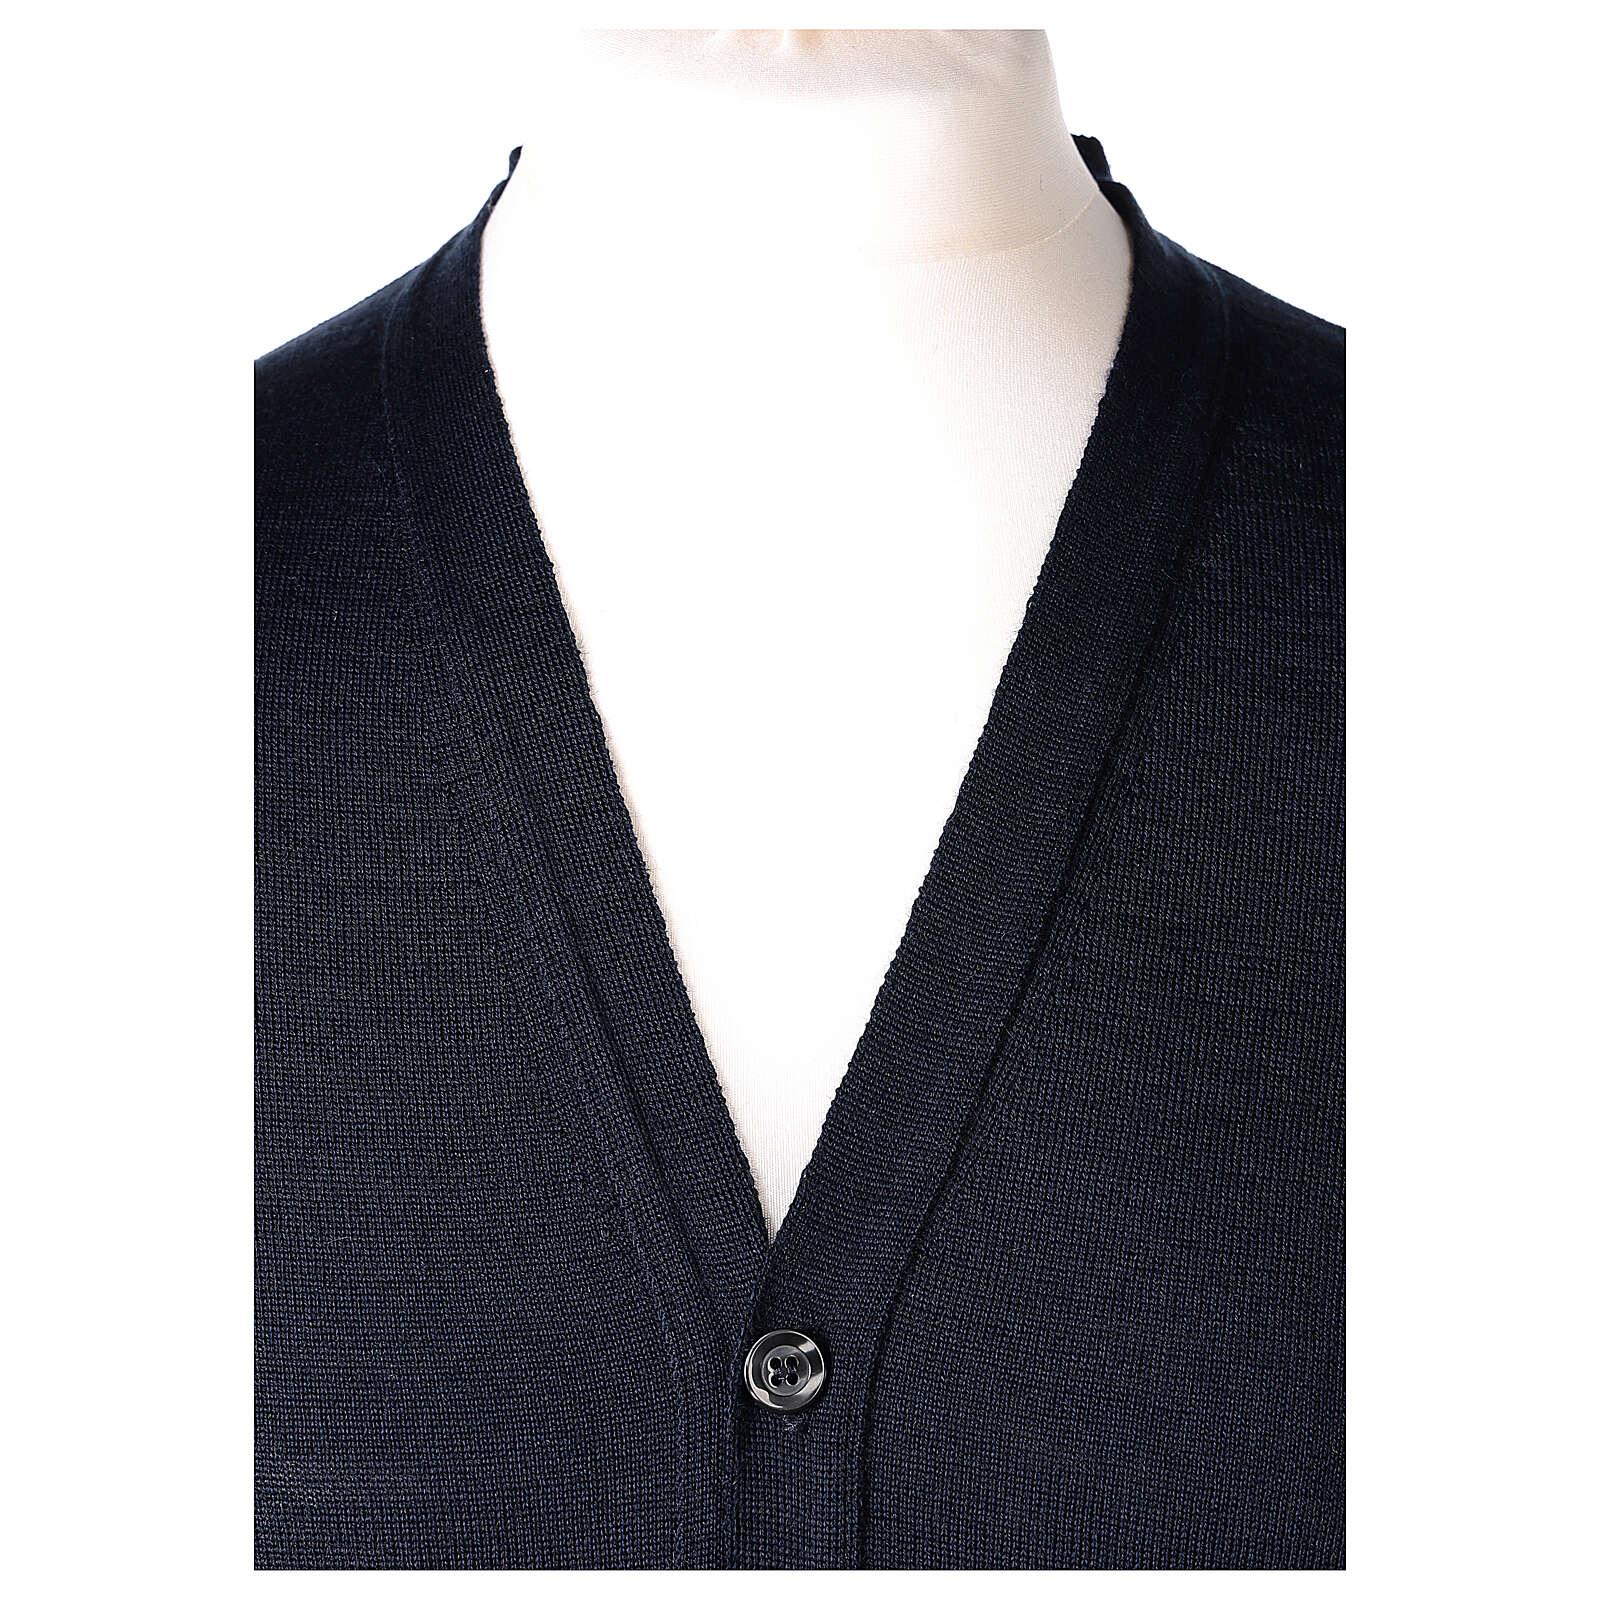 Chaqueta sacerdote azul manga larga punto al derecho 50% acrílico 50% lana merina In Primis 4